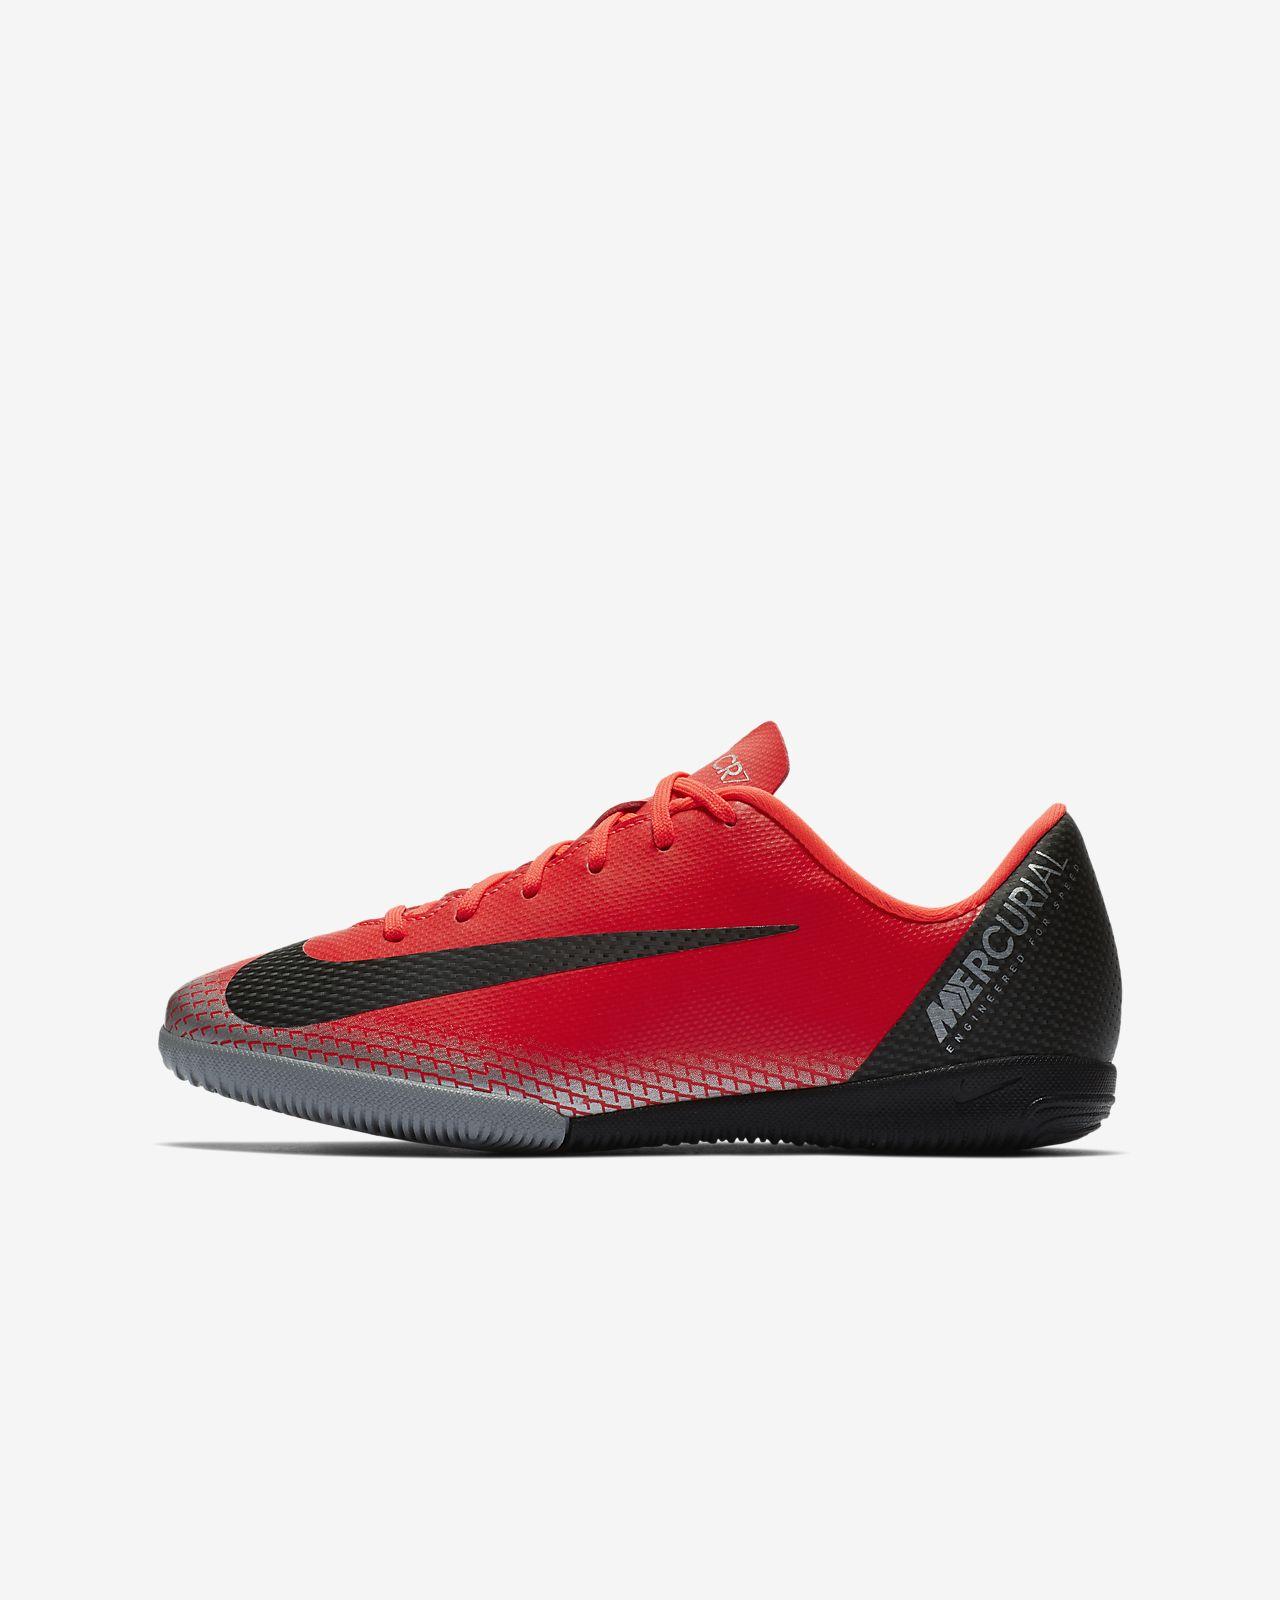 Calzado de fútbol para cancha cubierta para niños talla grande/pequeña Nike Jr. MercurialX Vapor XII Academy CR7